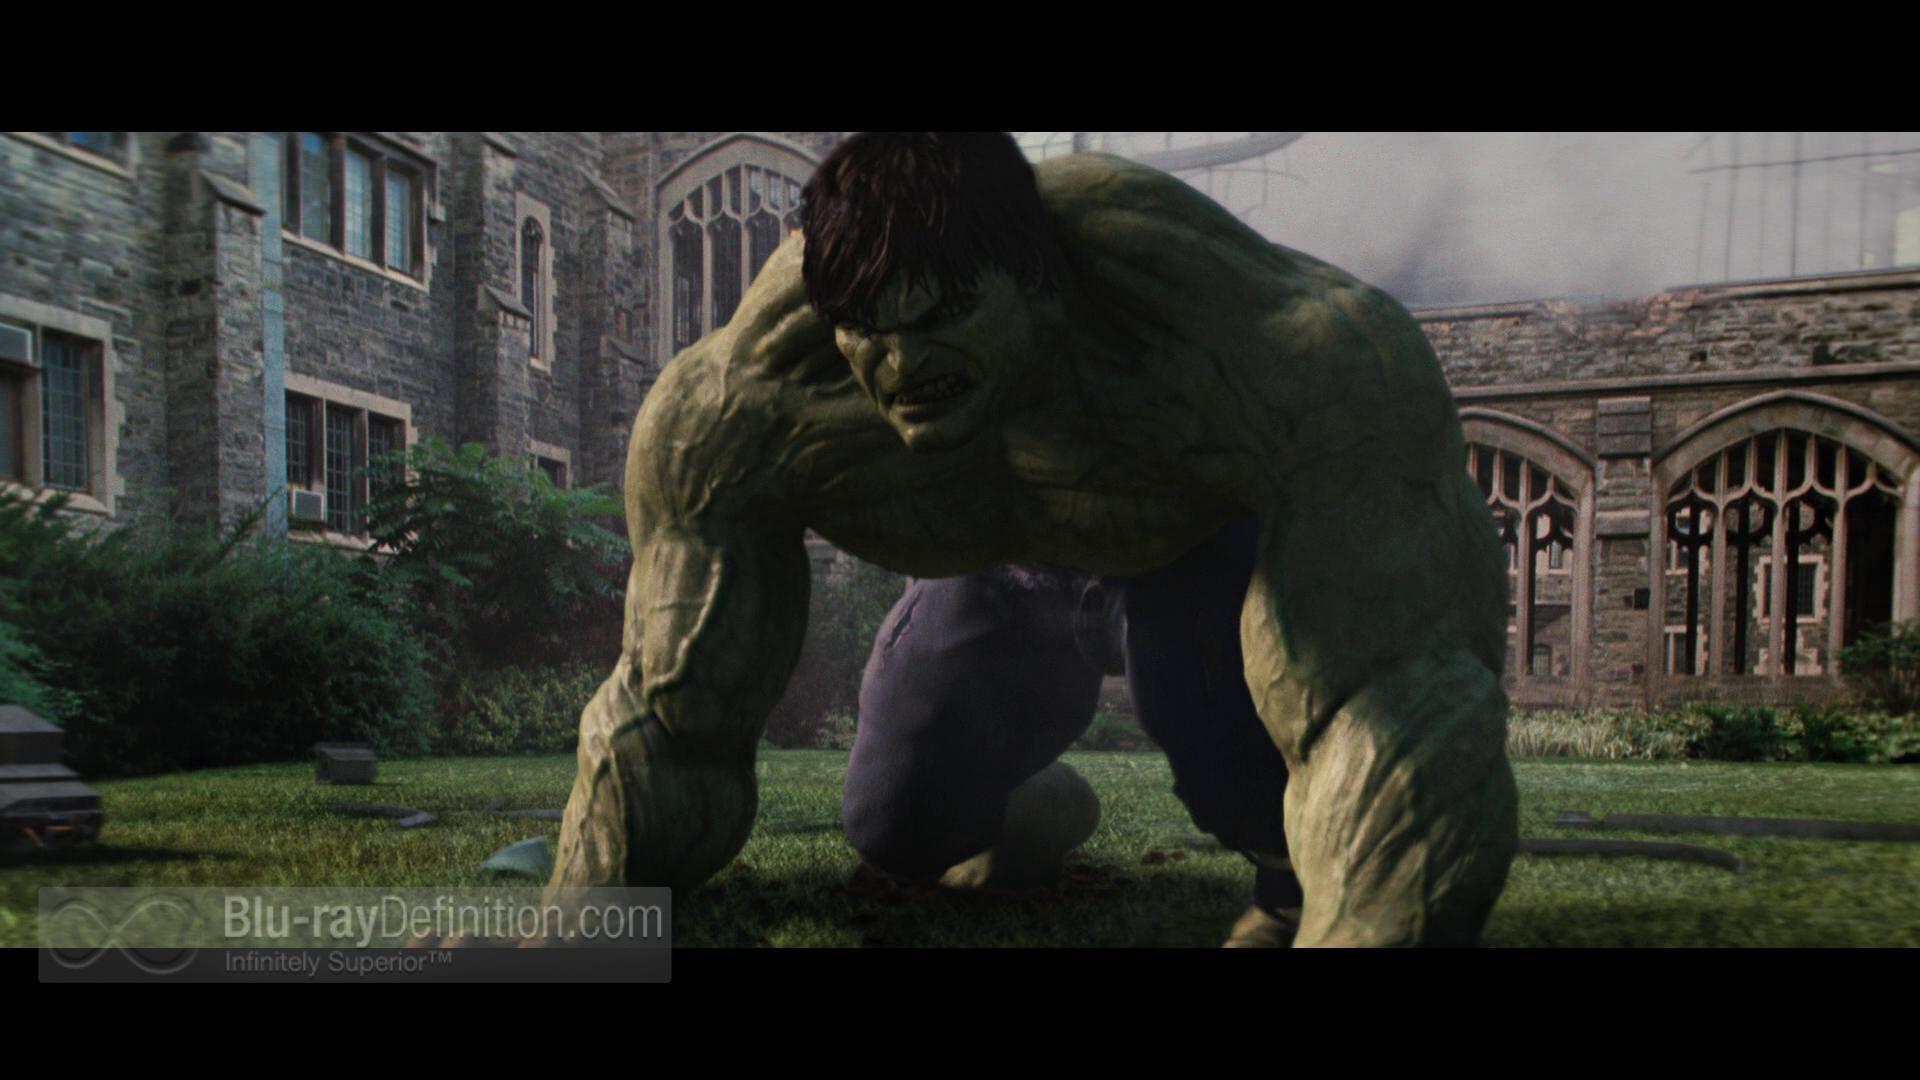 Hulk 2 Wallpapers 1920x1080